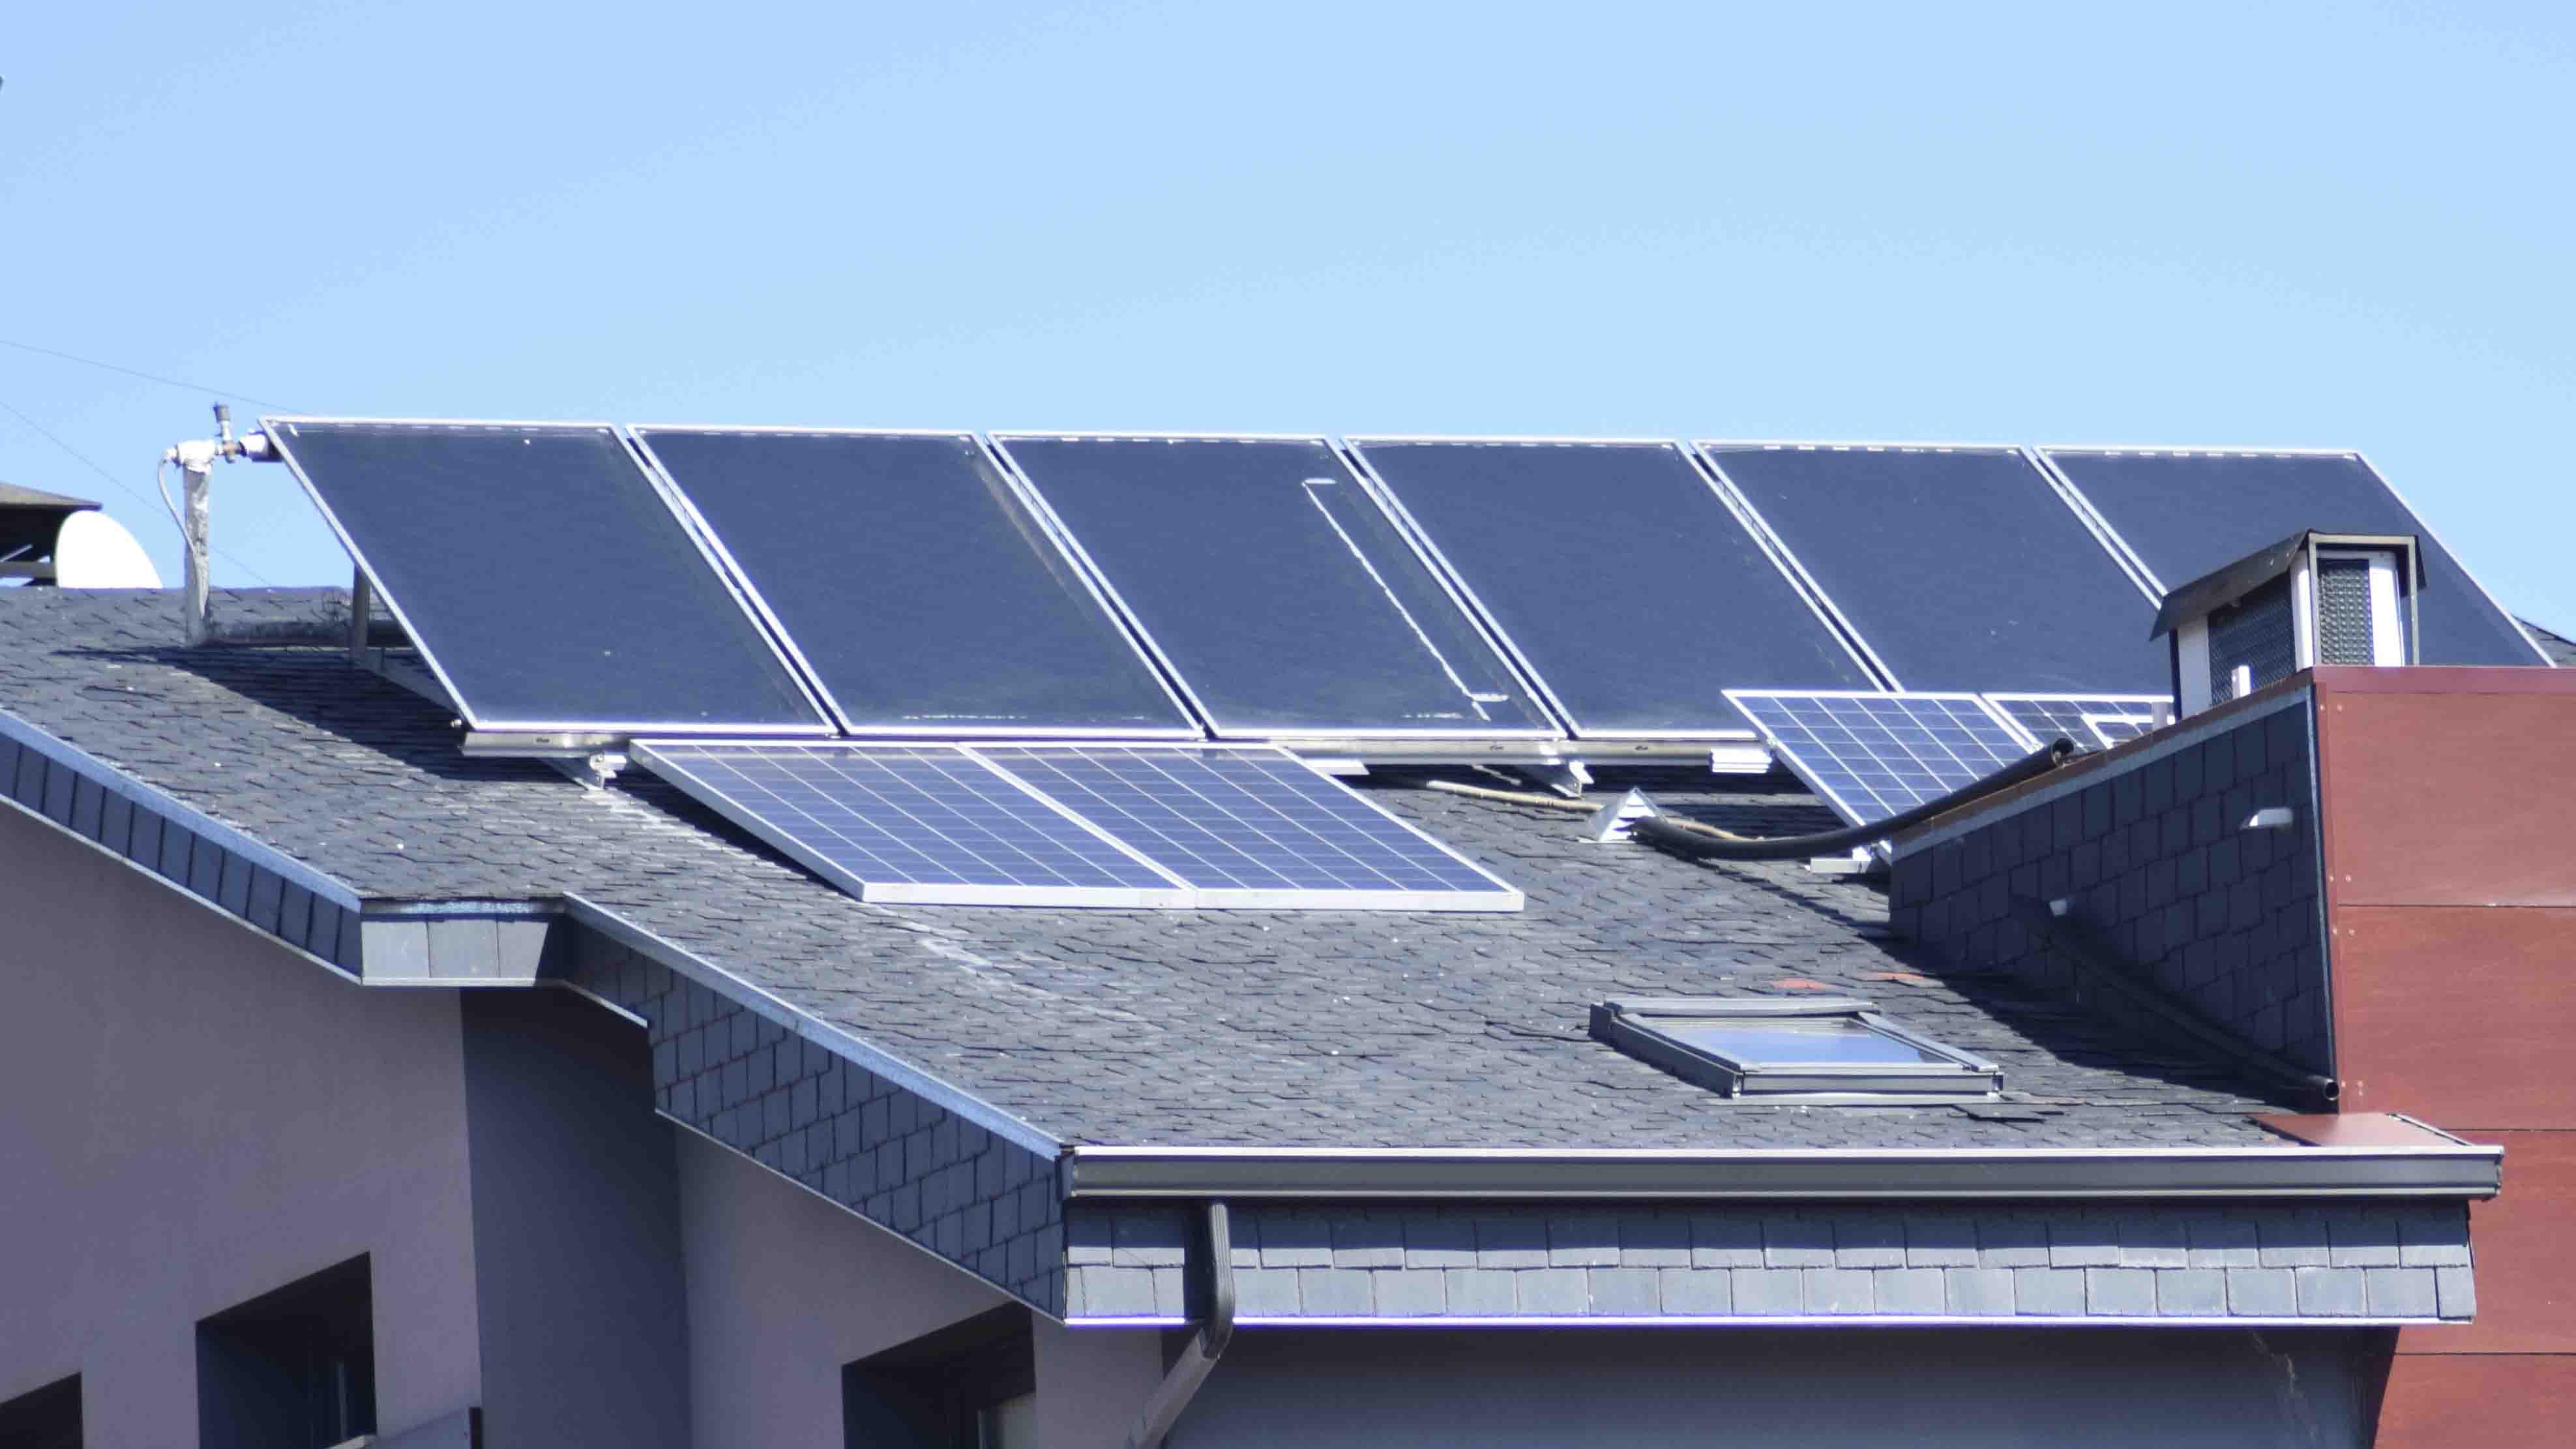 Suministro e instalacion de placas solares en chalet